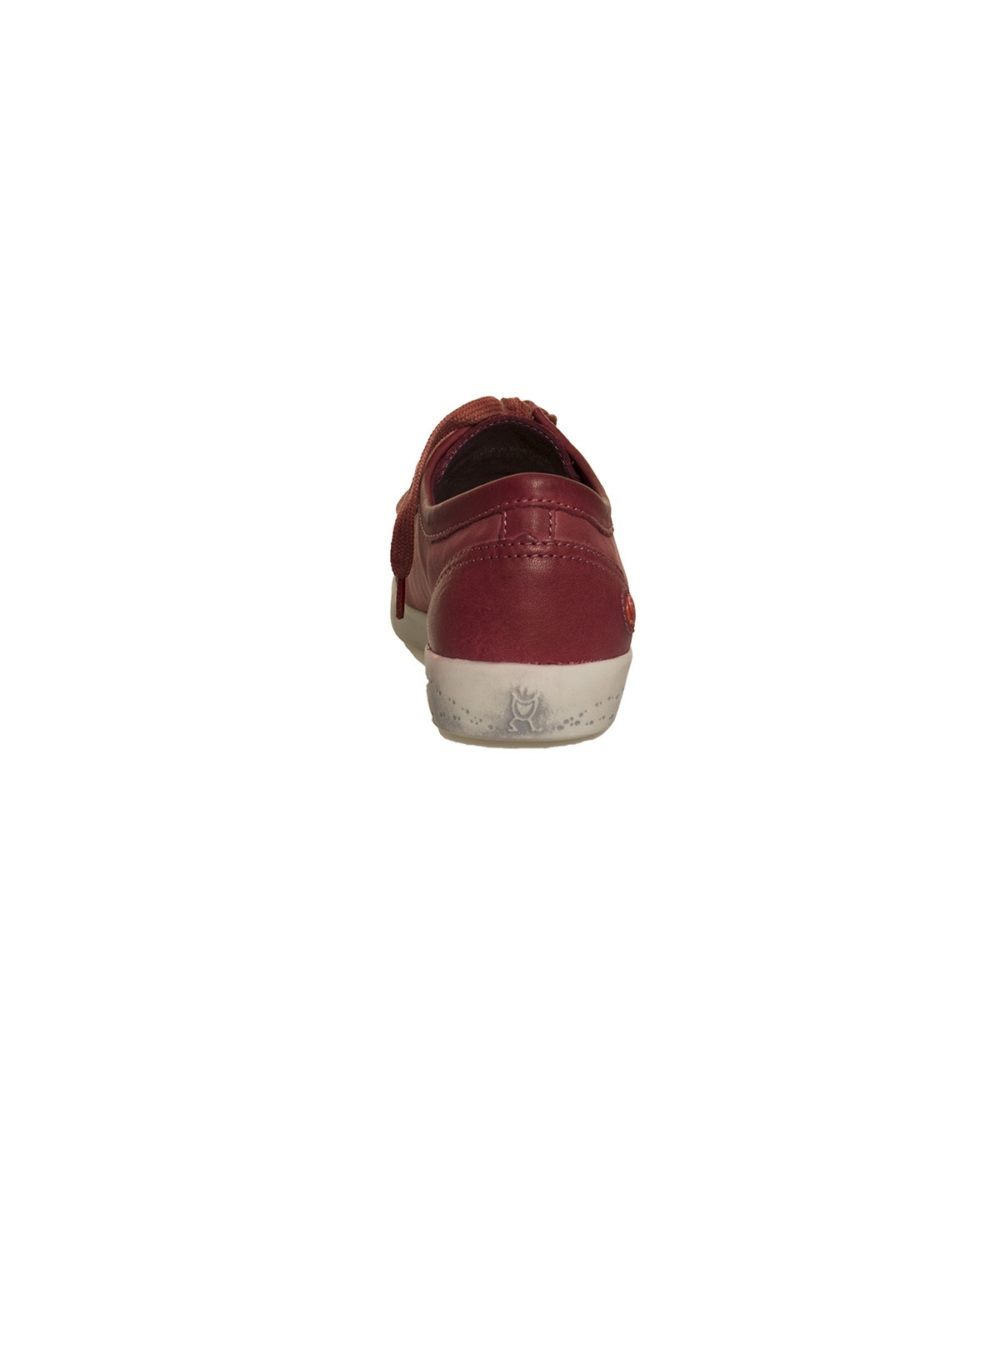 Isla Shoe Softinos Katie Kerr Women's Shoes